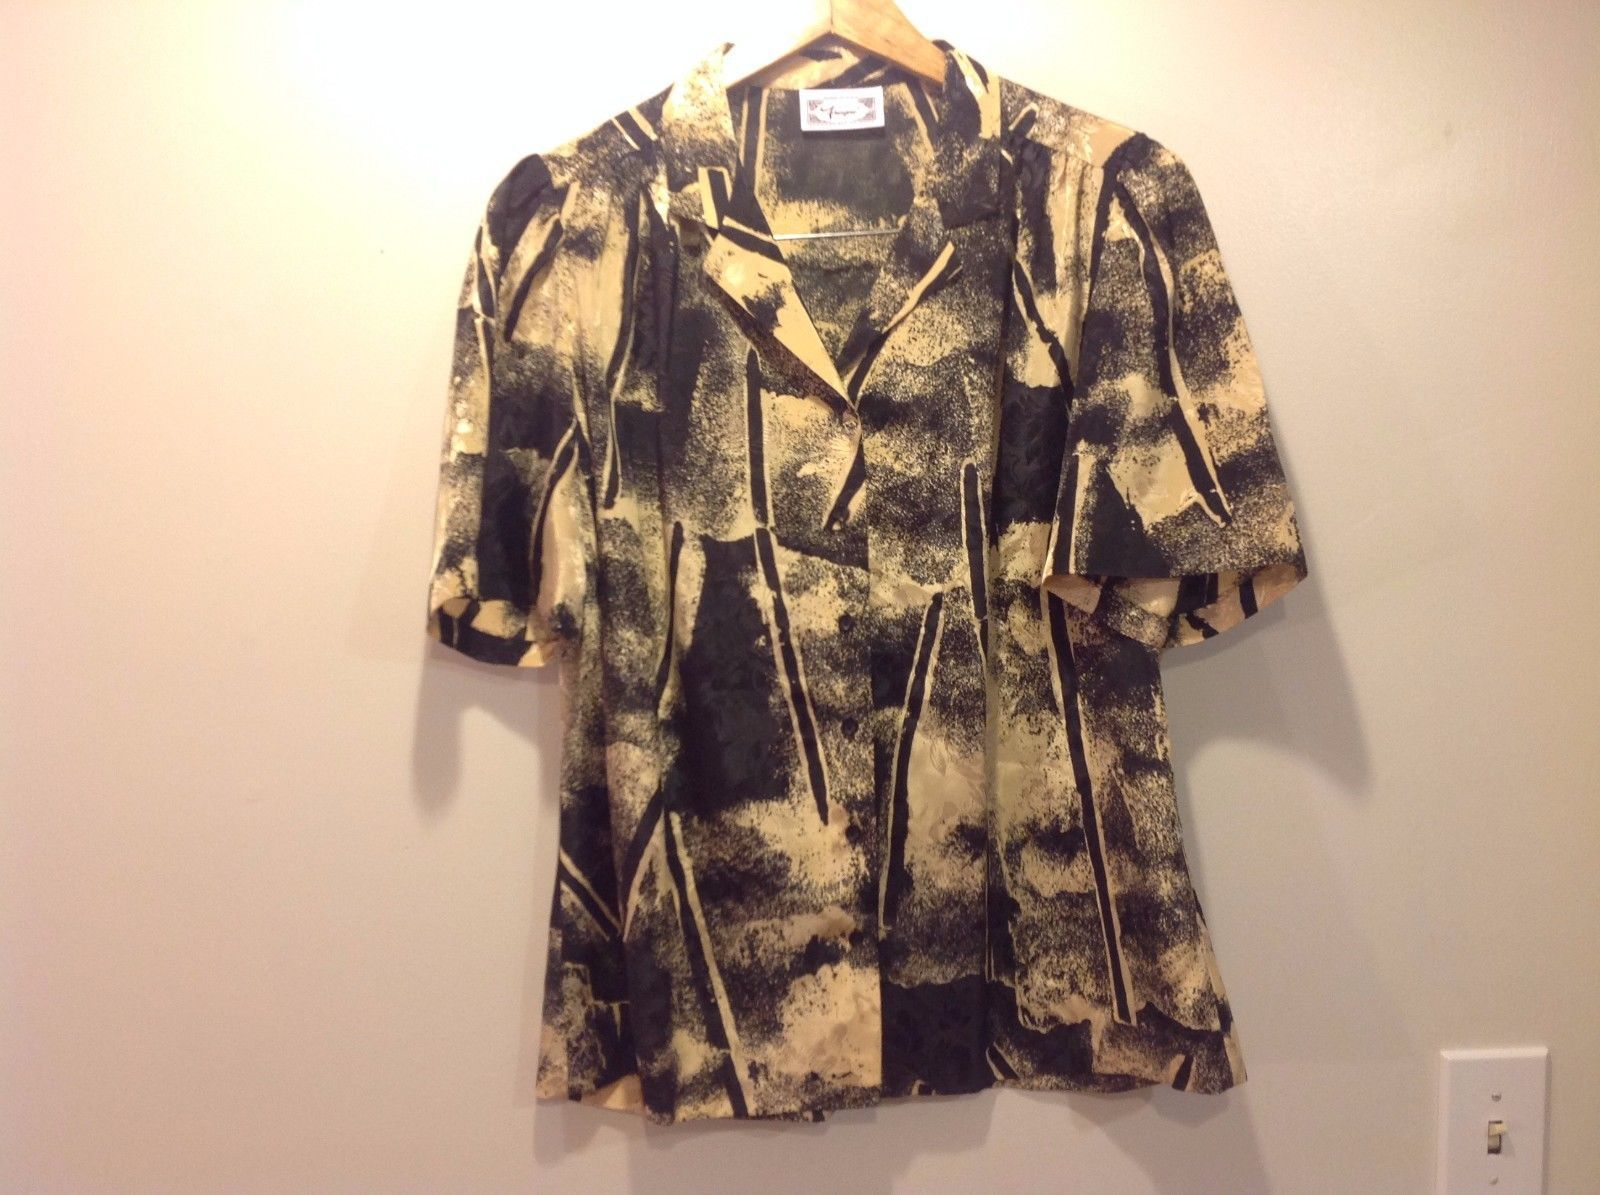 7 Rayne Button Up Shirt Made in USA Caribbean Design Tan Black